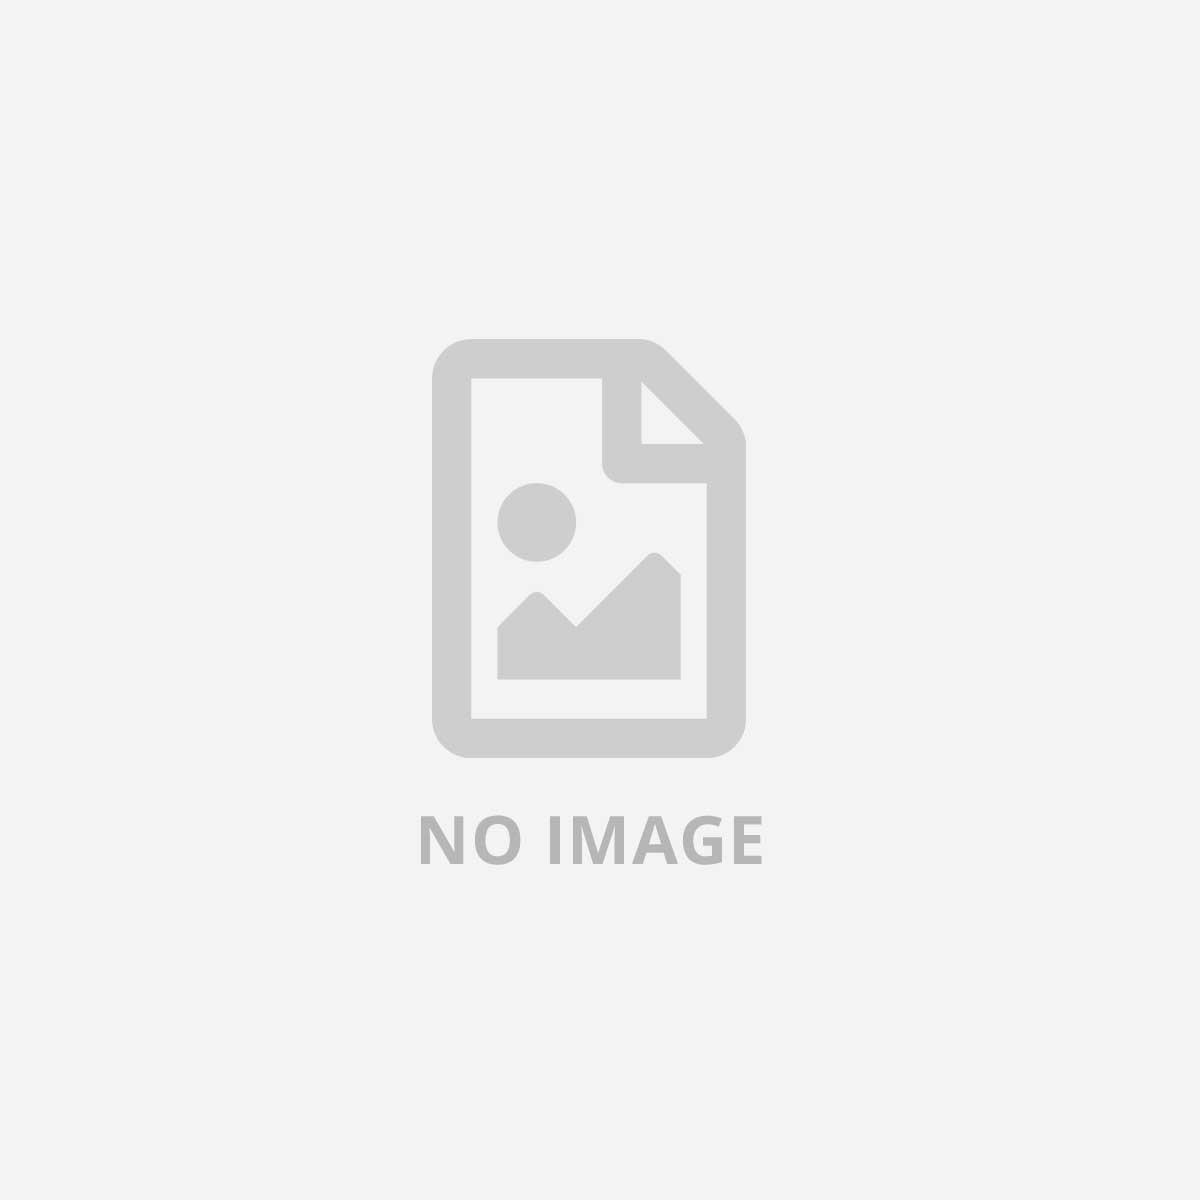 APC SMART-UPS  280W - 60 Hz